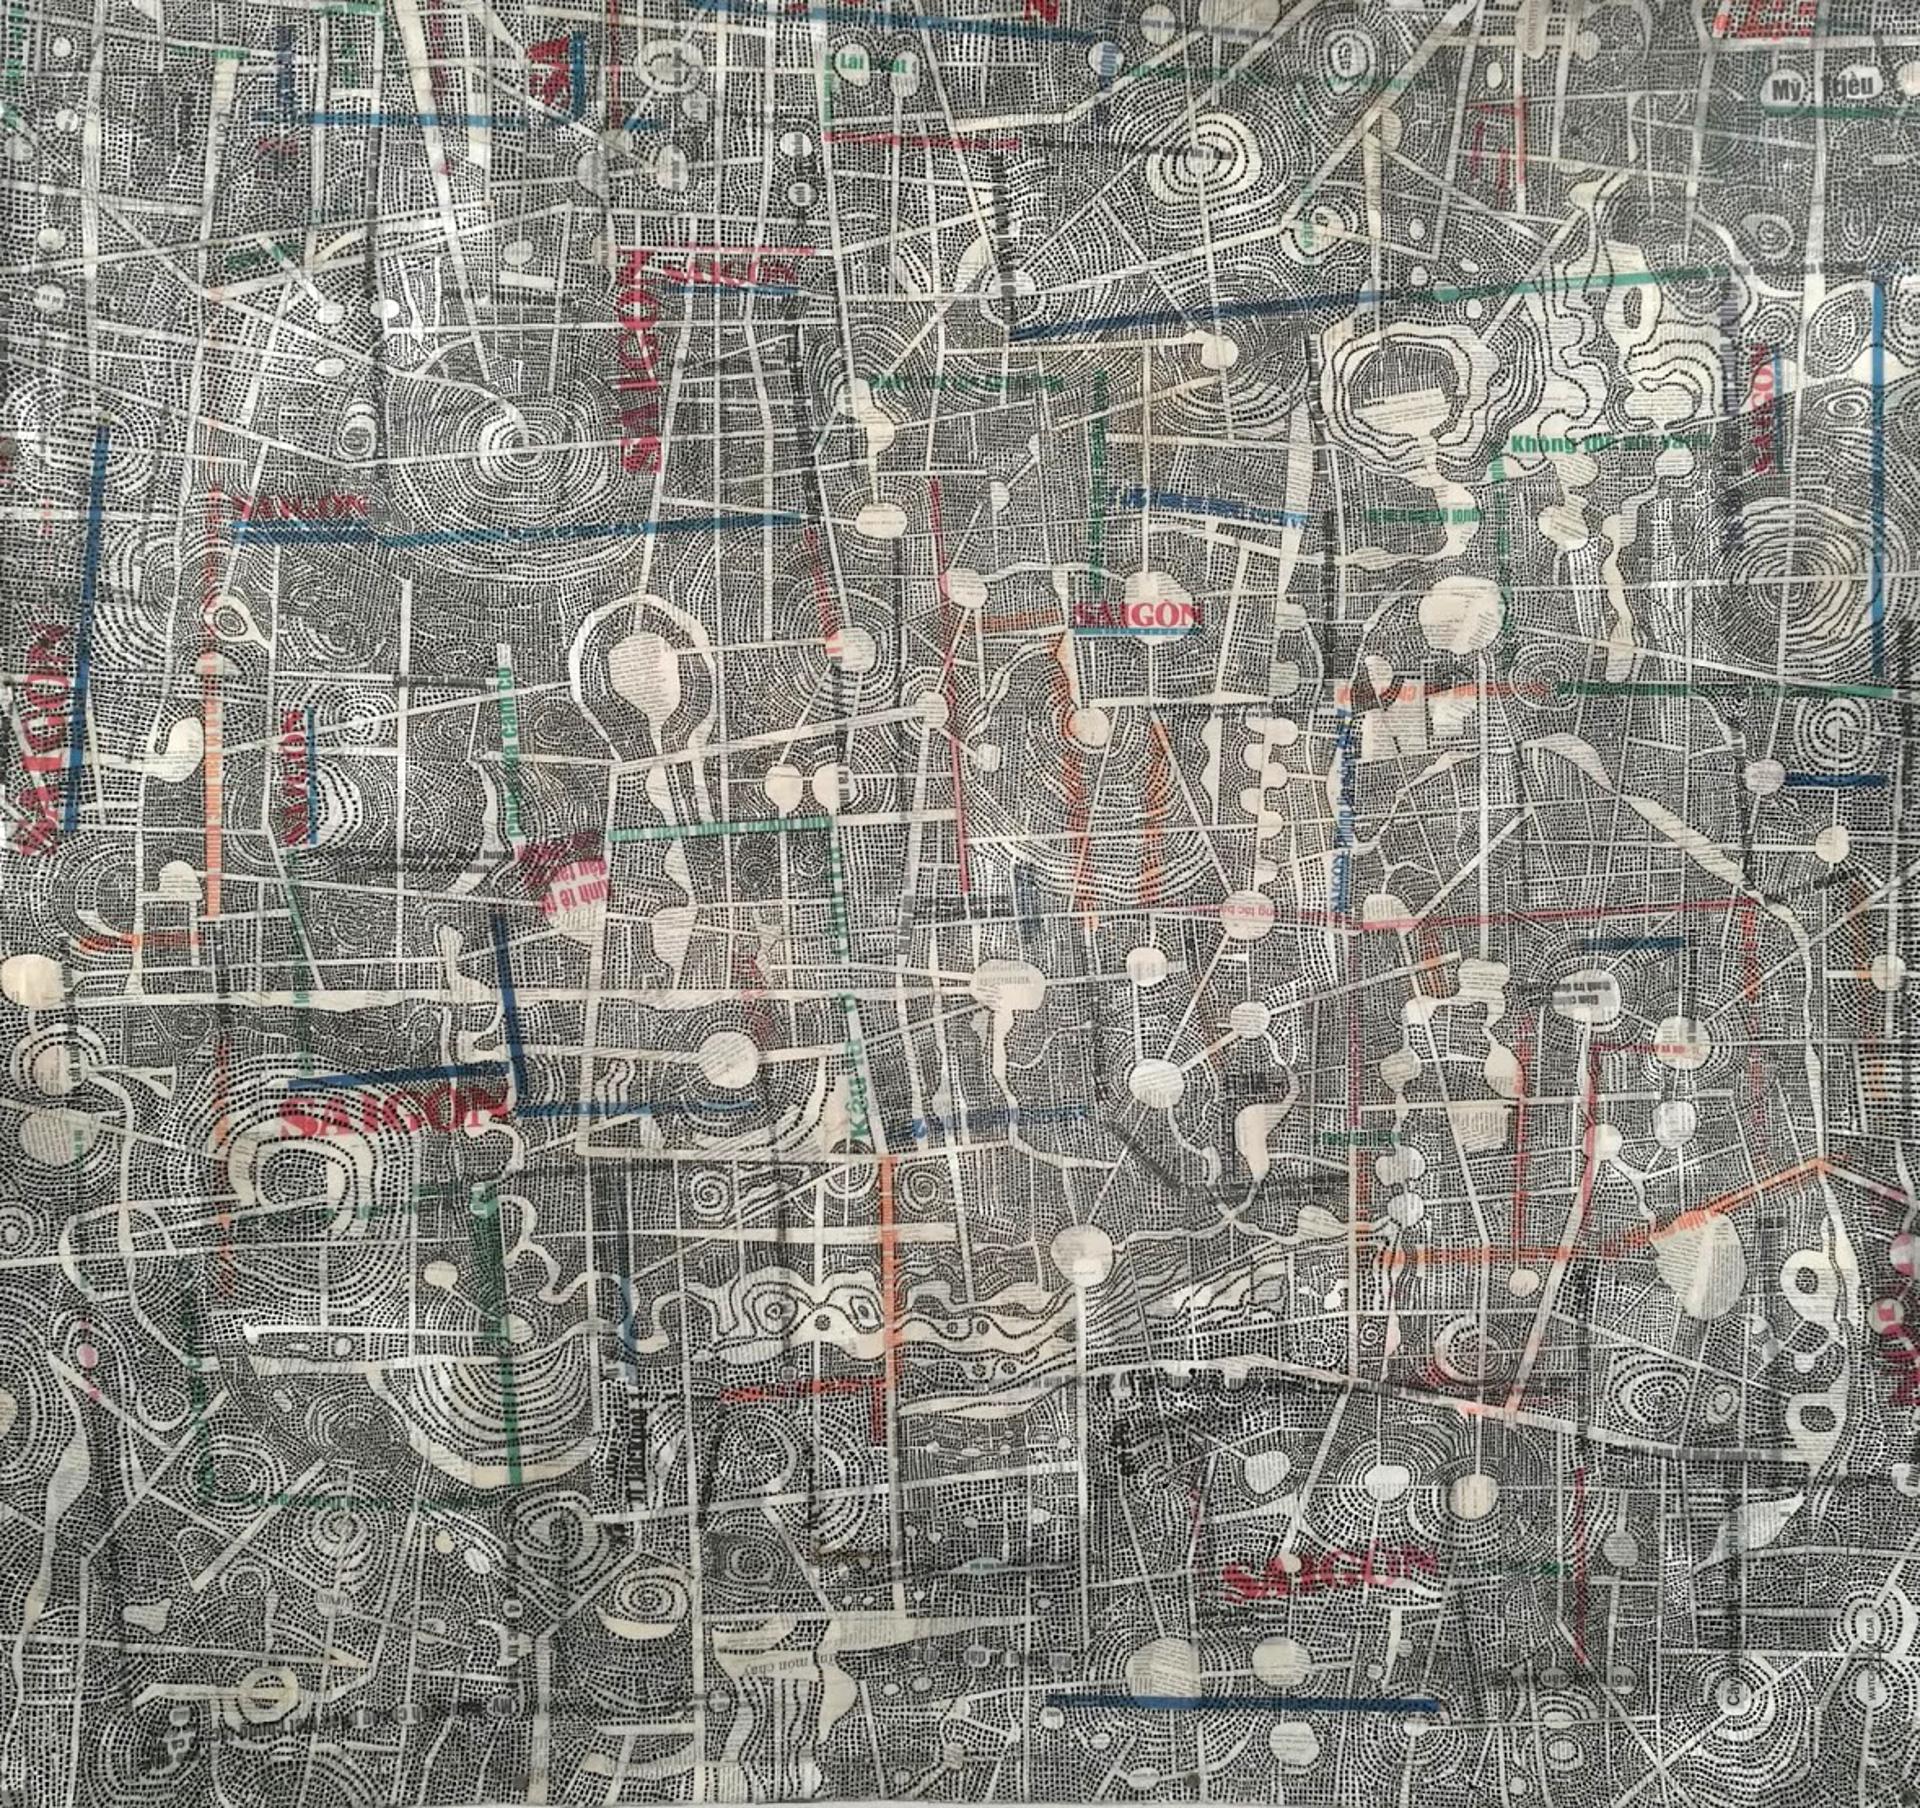 Land Dragon (The Map) by Chau Huynh